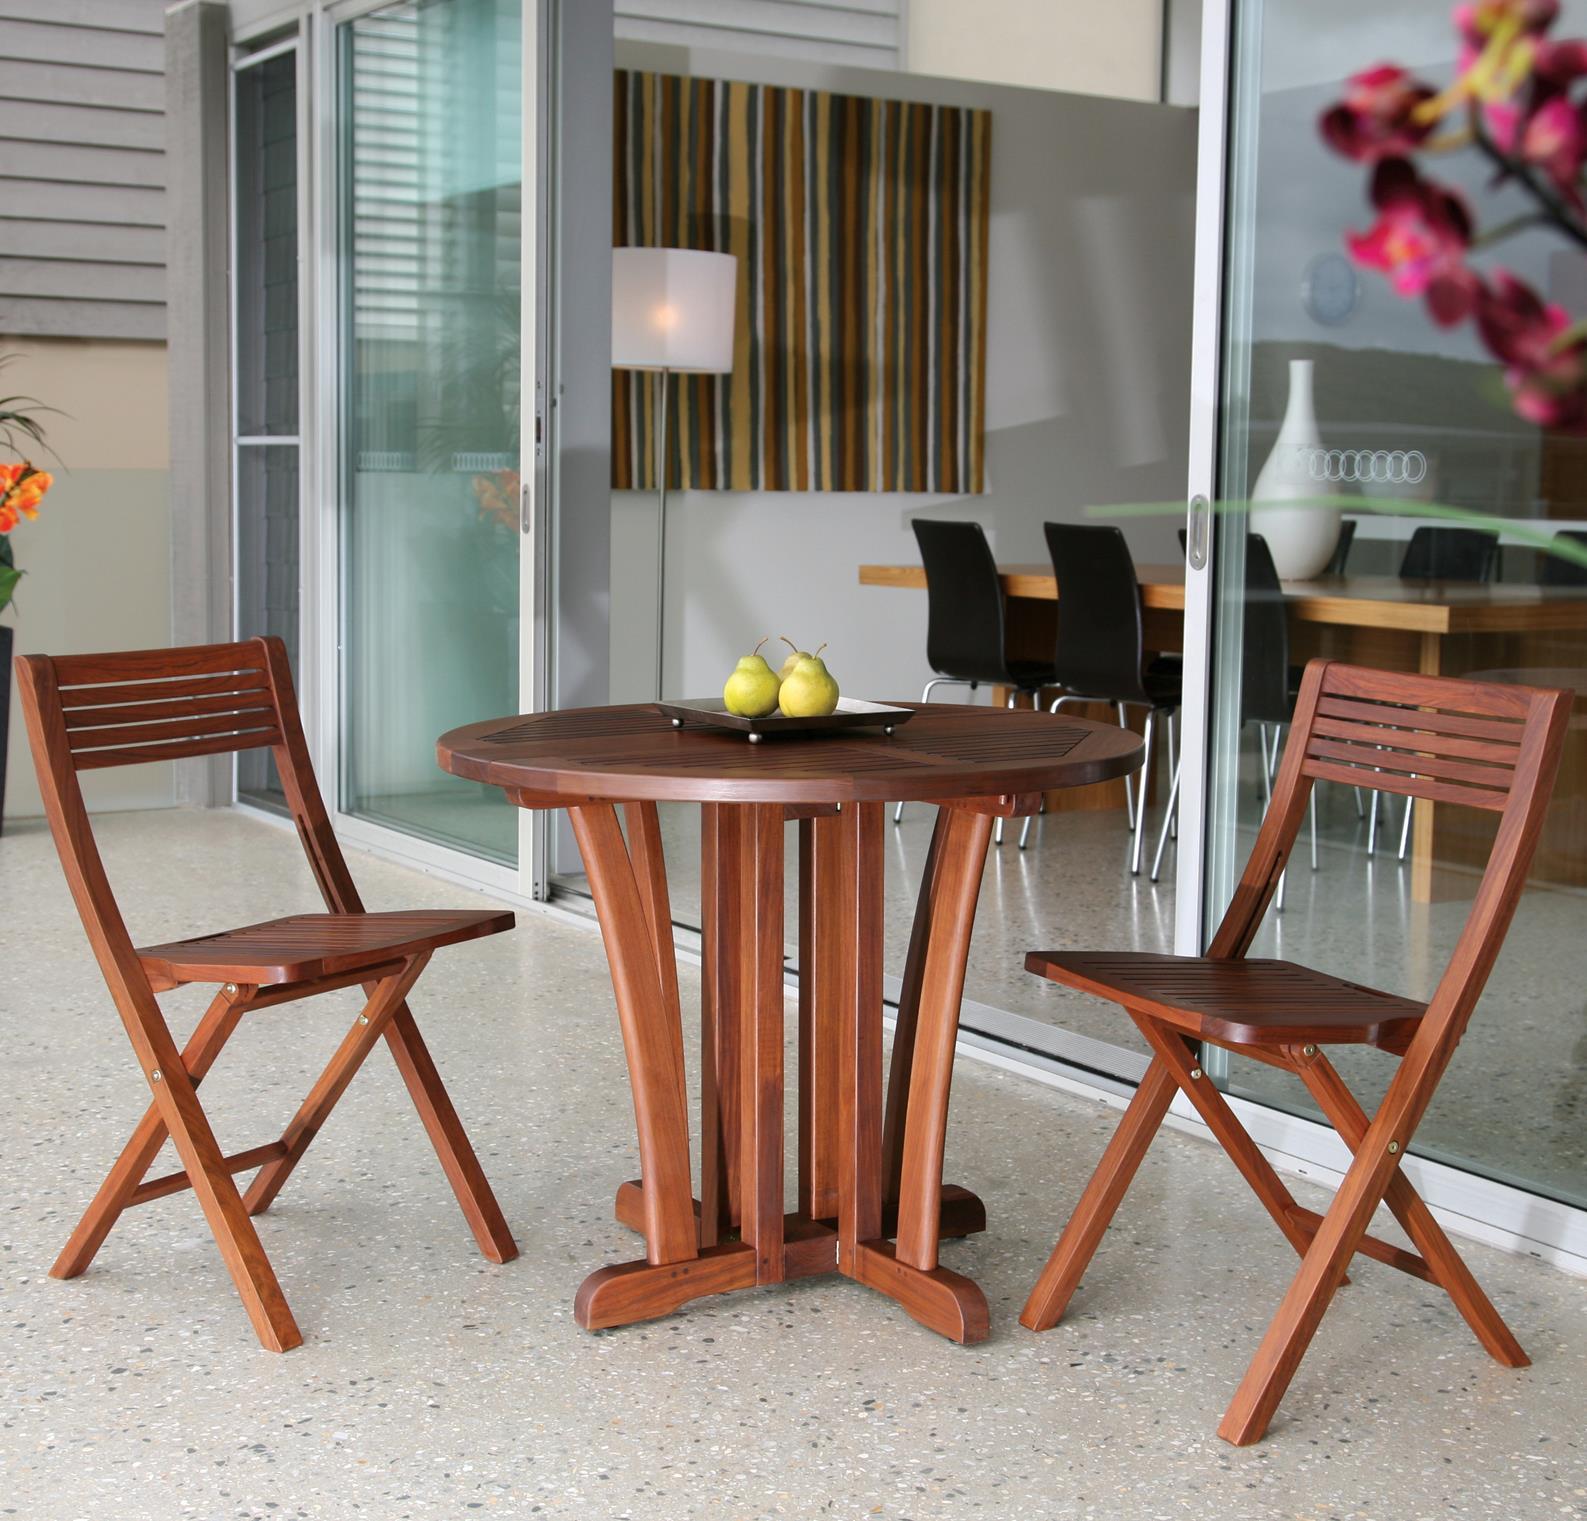 Jensen Leisure Gateleg Bistro Table And Pearl Folding Chairs Set Becker Furniture World